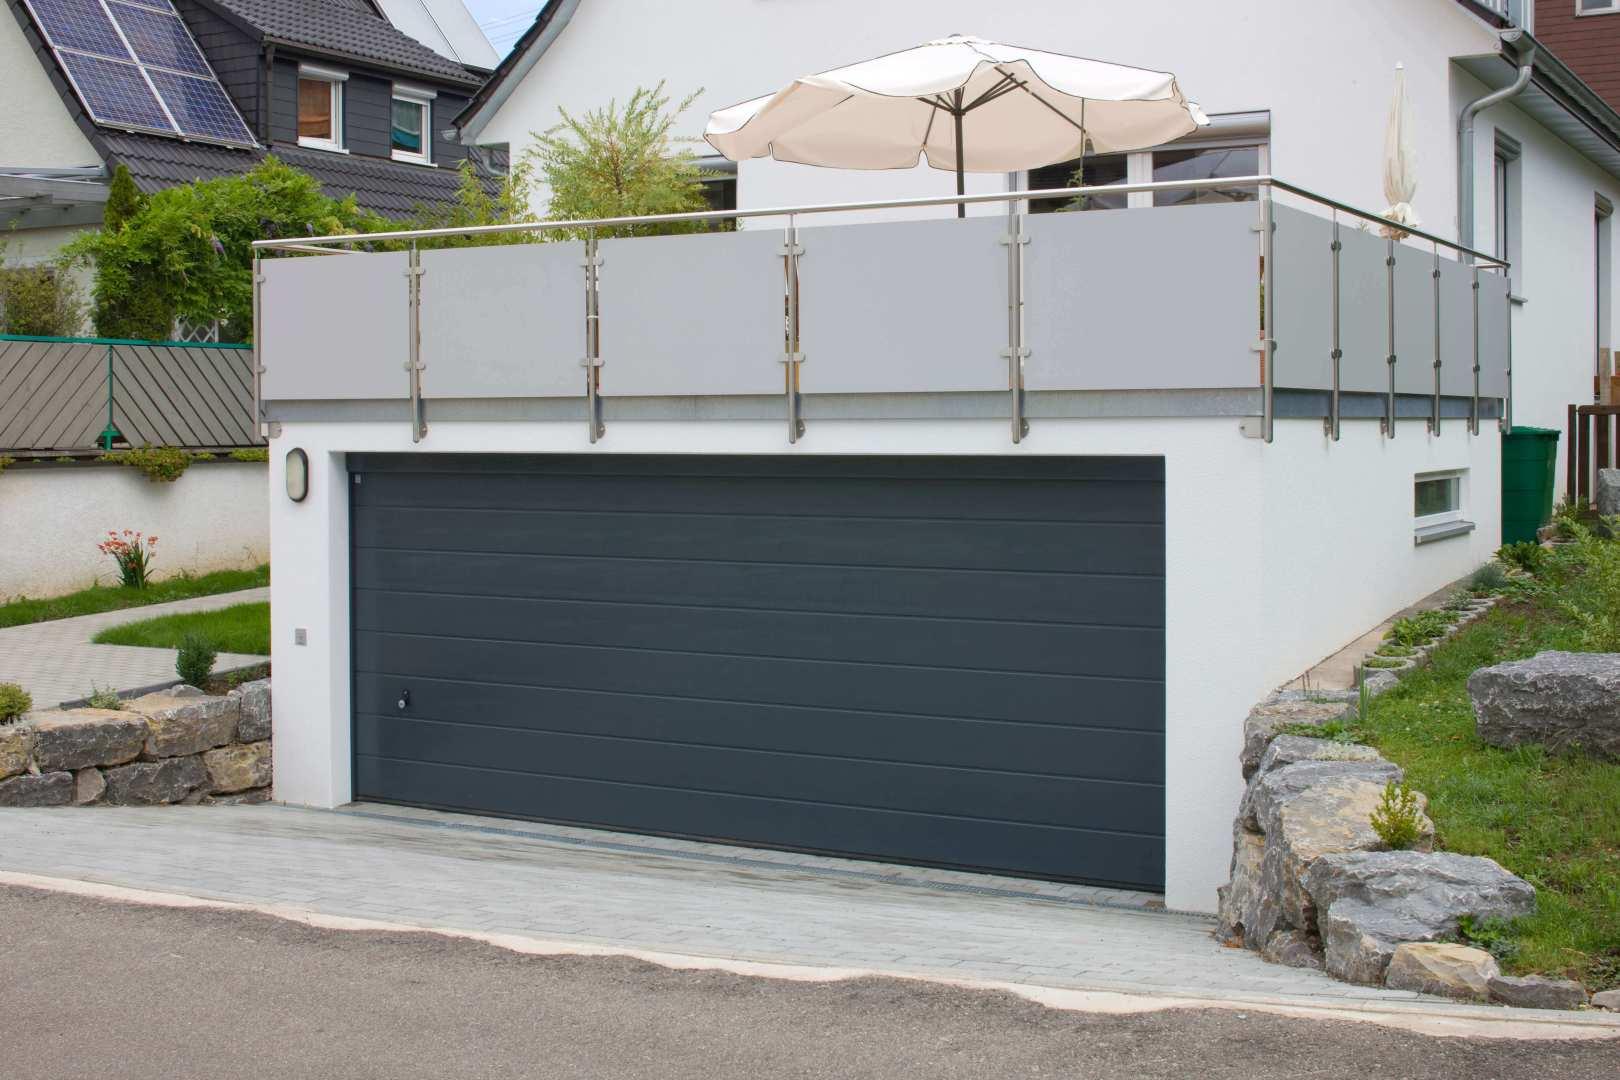 carport dach als terrasse nutzen carport dach als terrasse nutzen innenr ume und m bel ideen. Black Bedroom Furniture Sets. Home Design Ideas